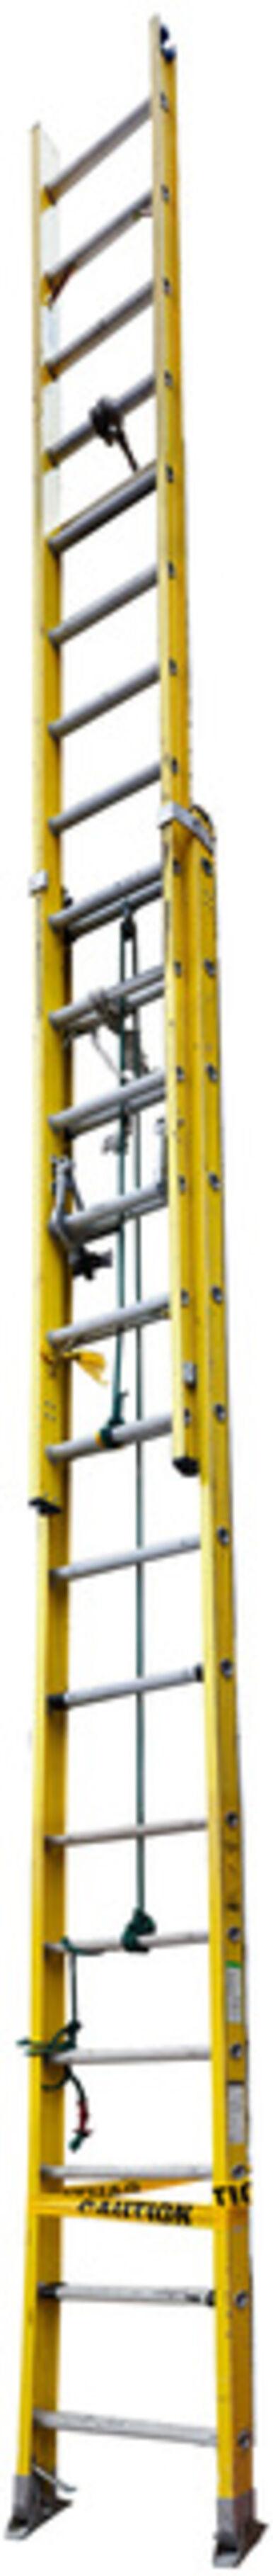 Jennifer Williams, 'Extra Large Extension Ladder: Yellow', 2013